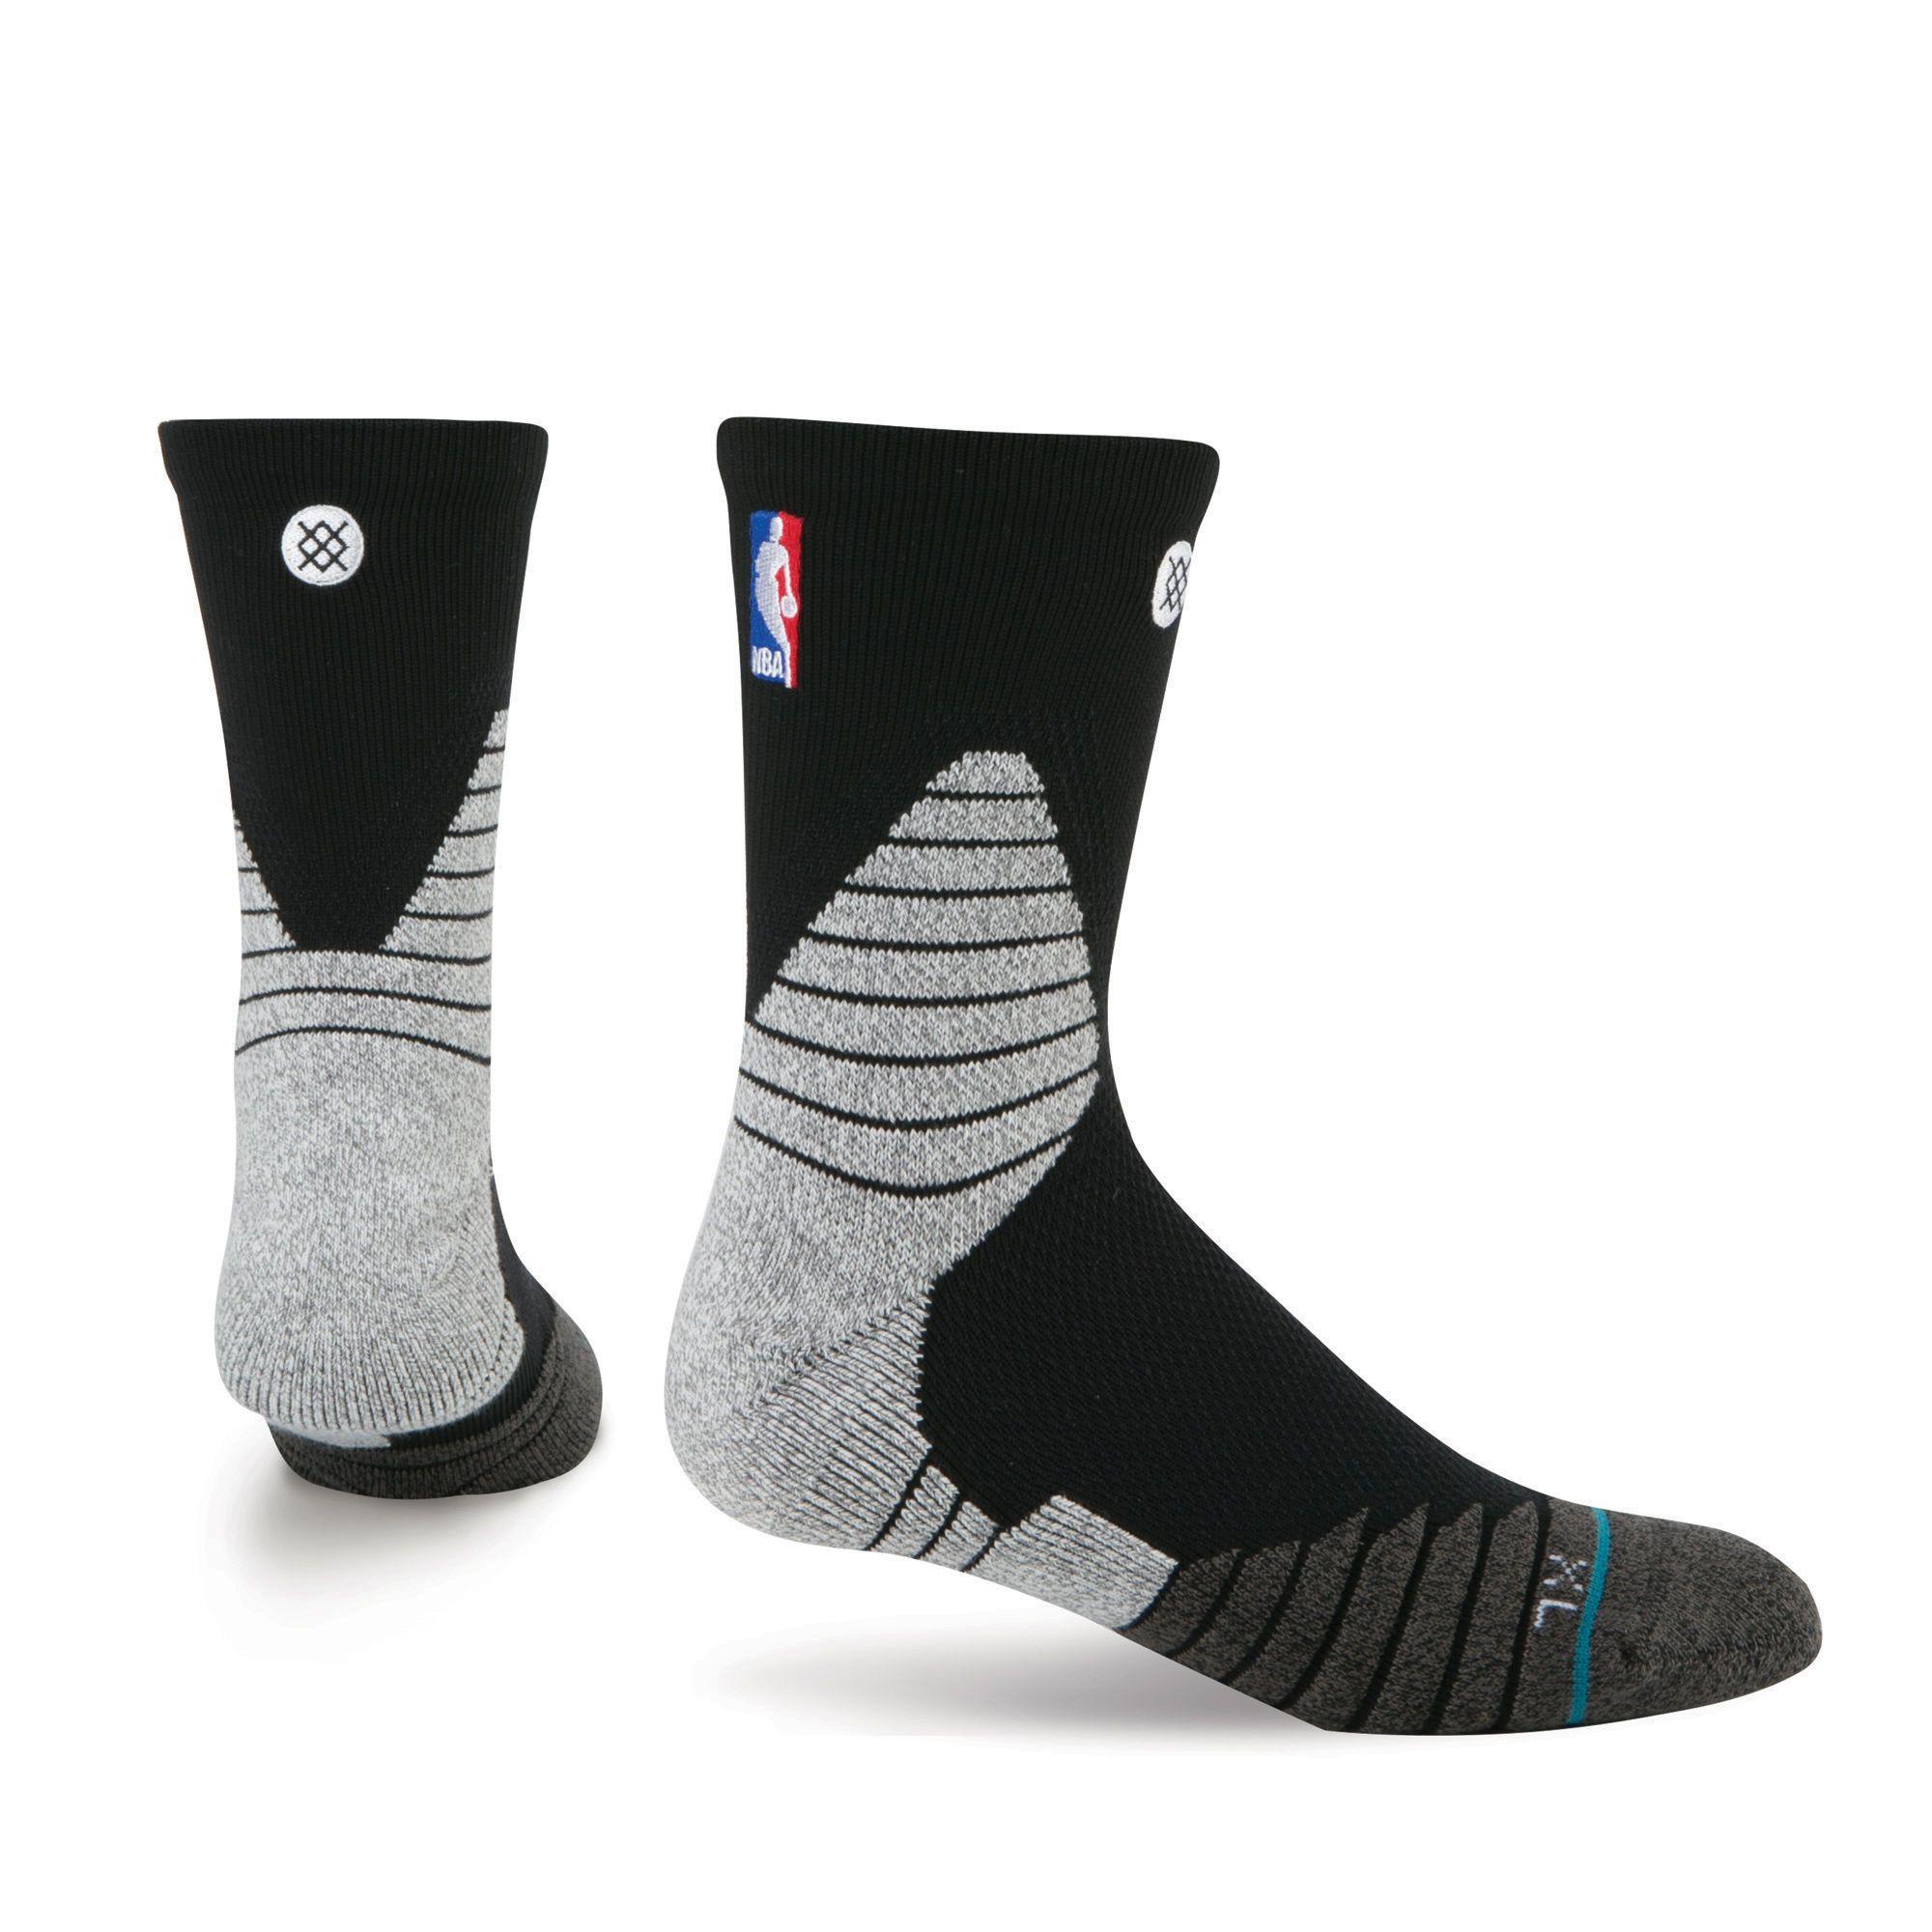 Solid Qtr Mens NBA On Court Socks Stance Nba fashion